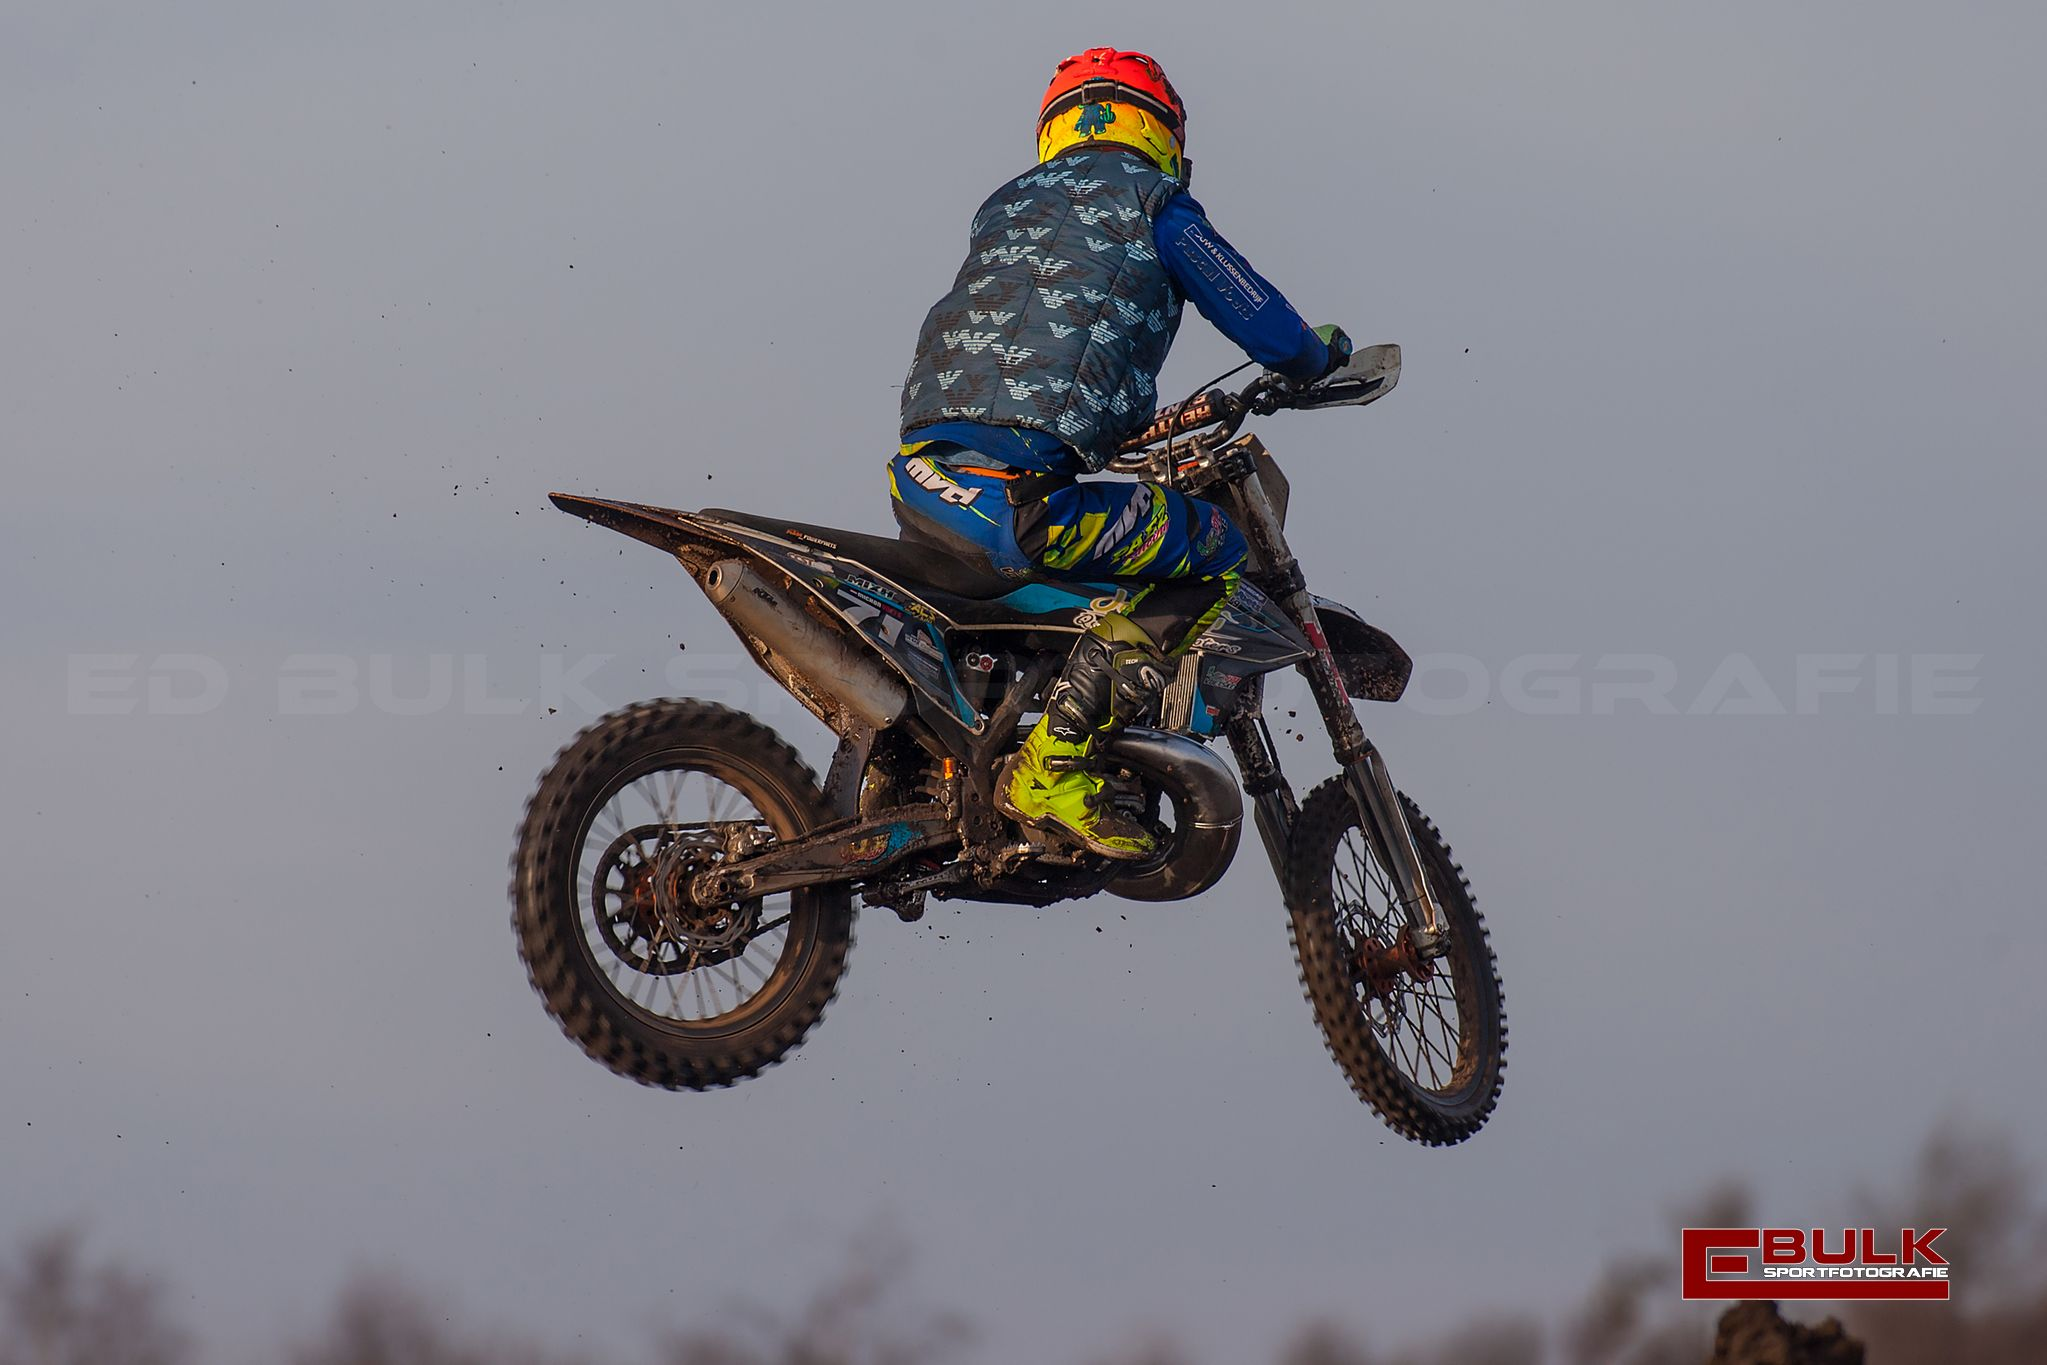 ebs_1616-ed_bulk_sportfotografie